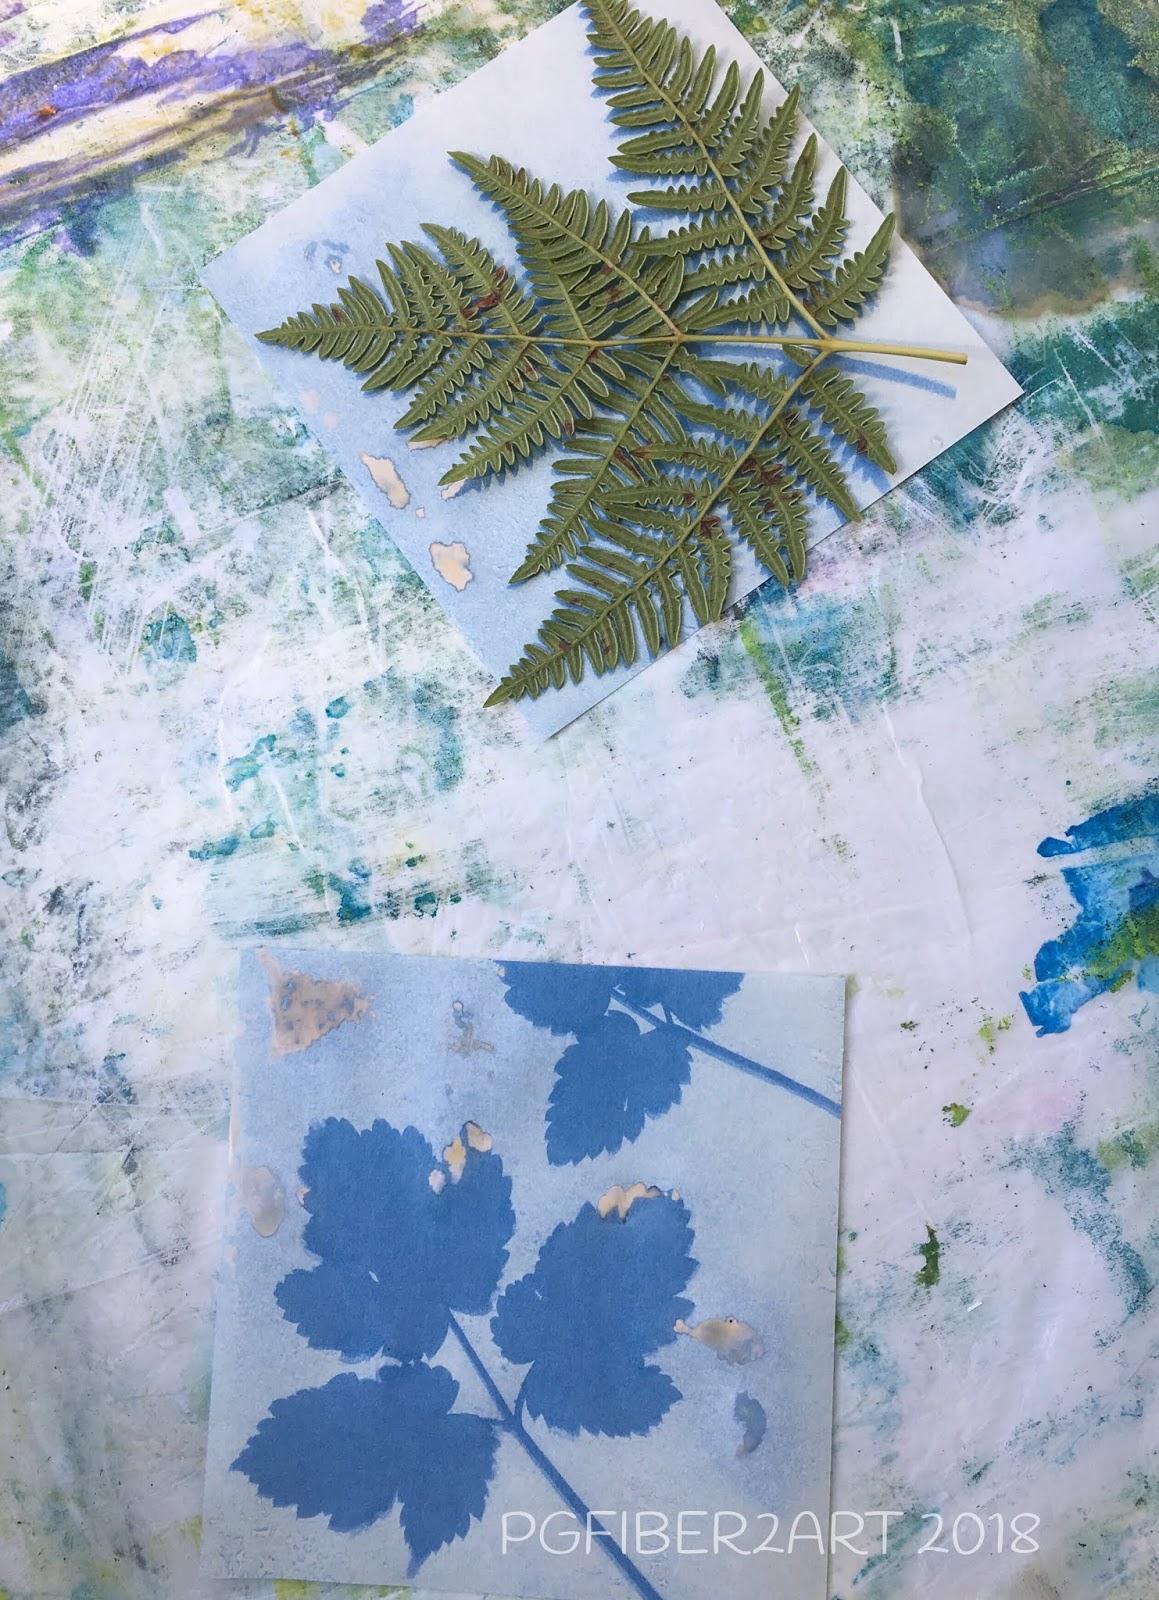 PG Fiber2Art: Experimenting with Sunprint Paper